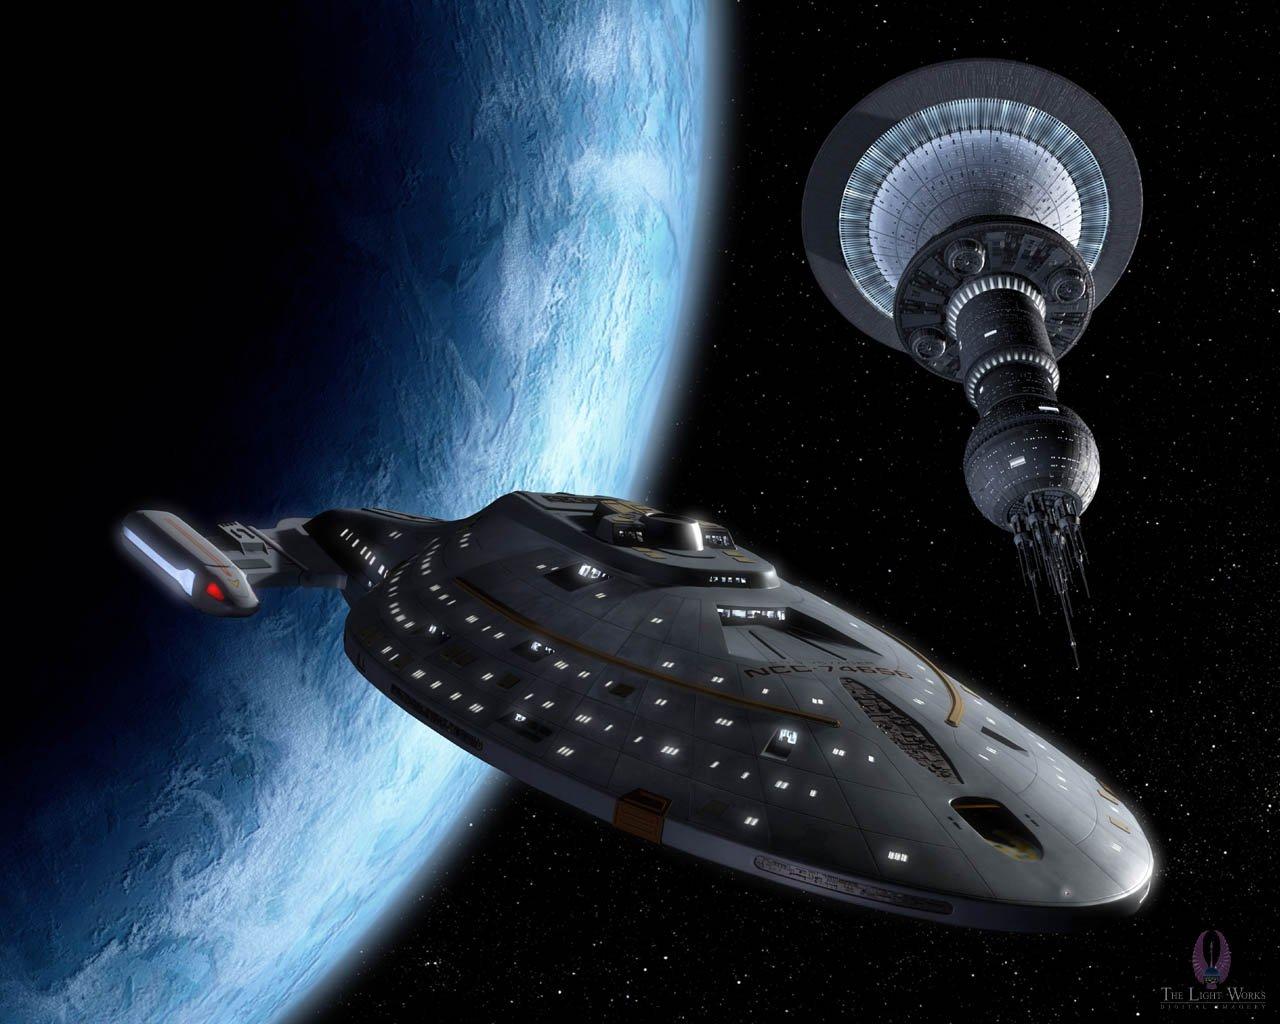 Star trek – voyager and starbase